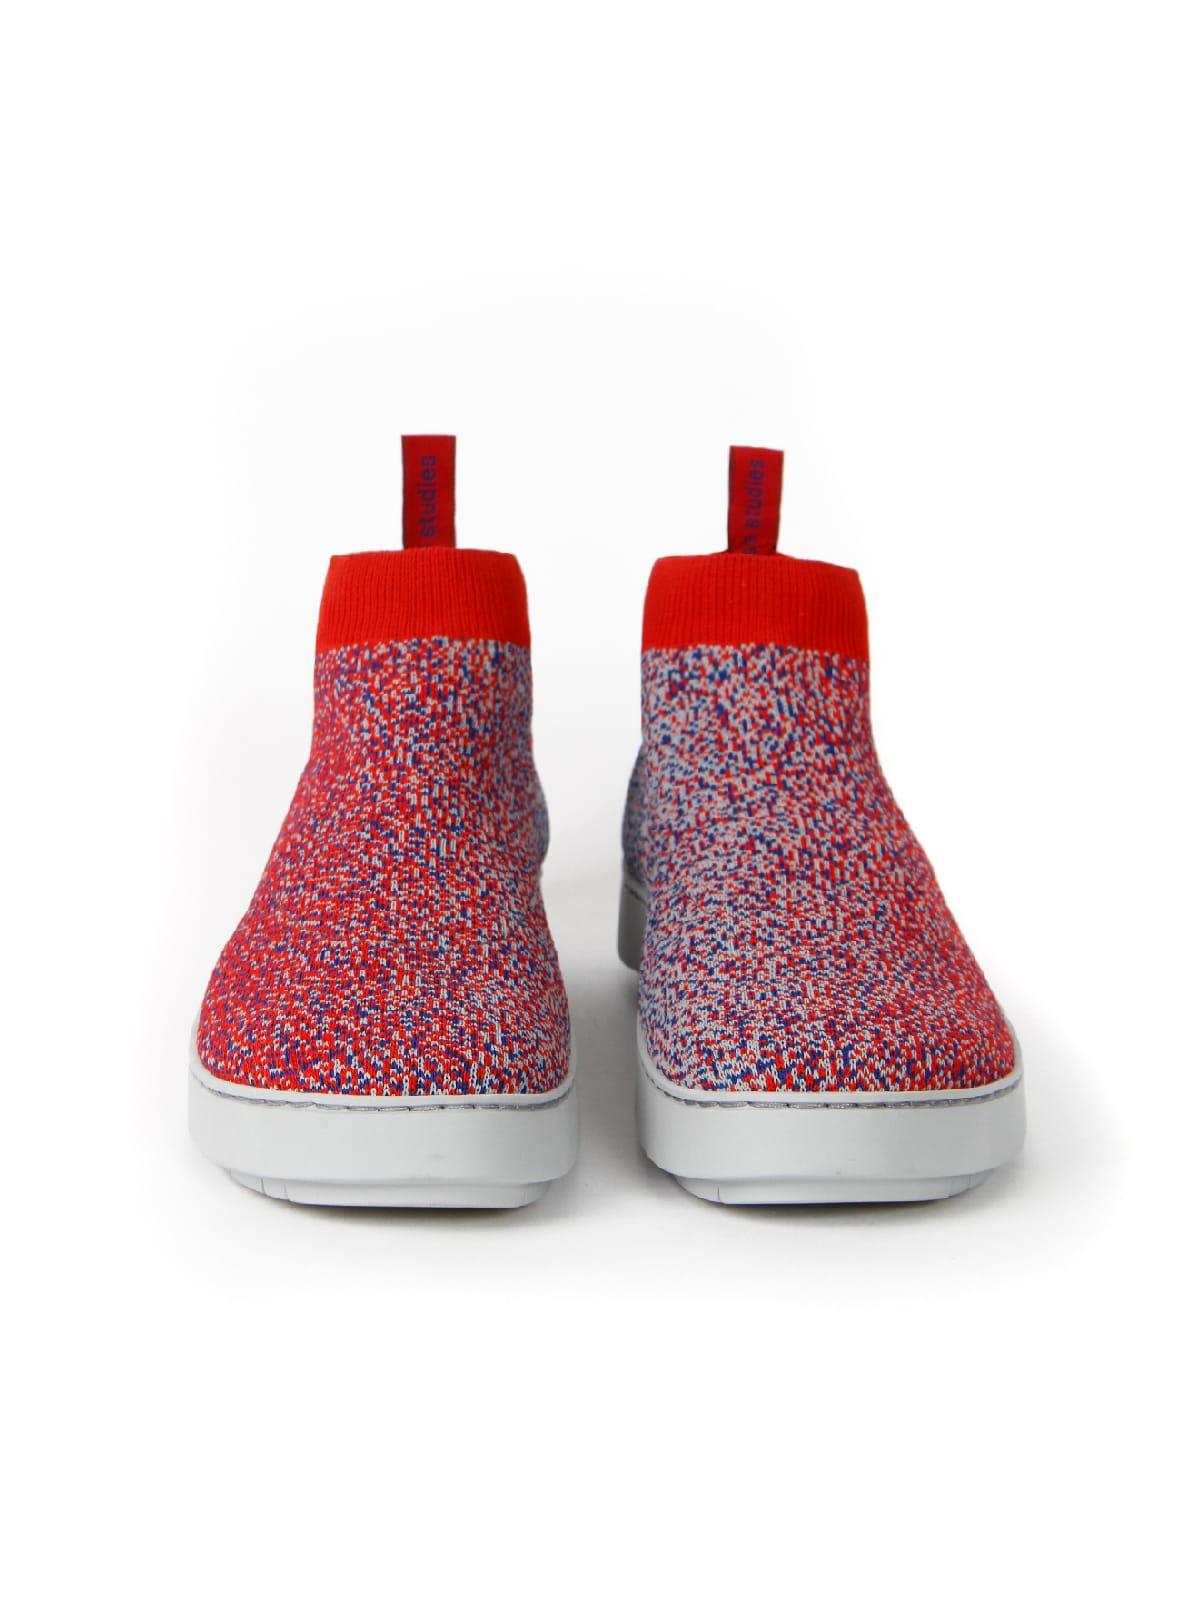 3D knitted sockboot Spexx Poppy vorne